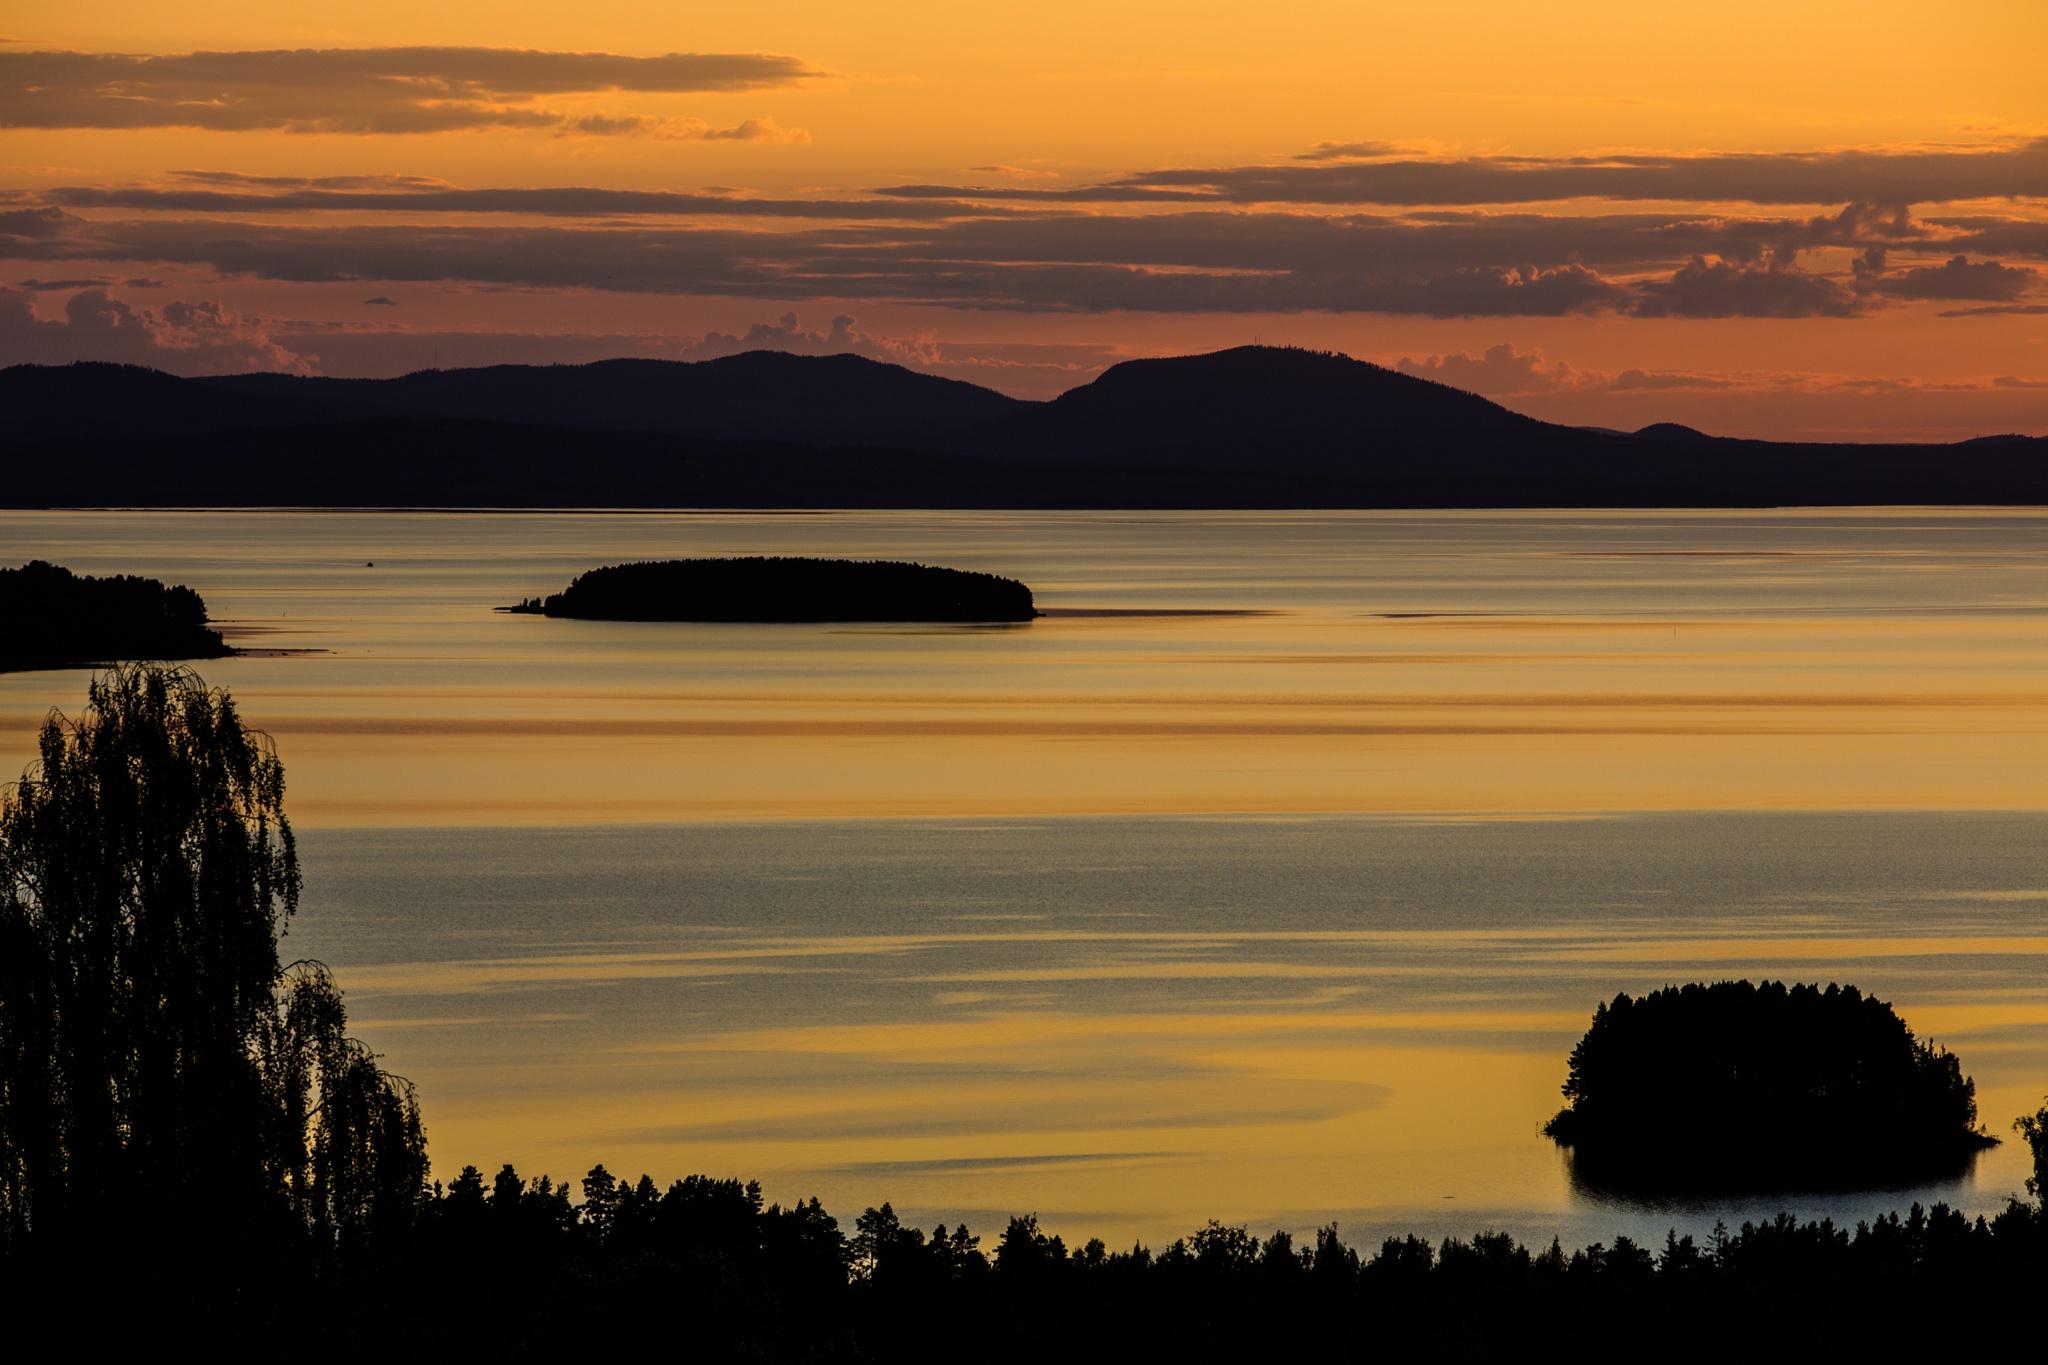 evening, Dalarna, Sweden by hutchst